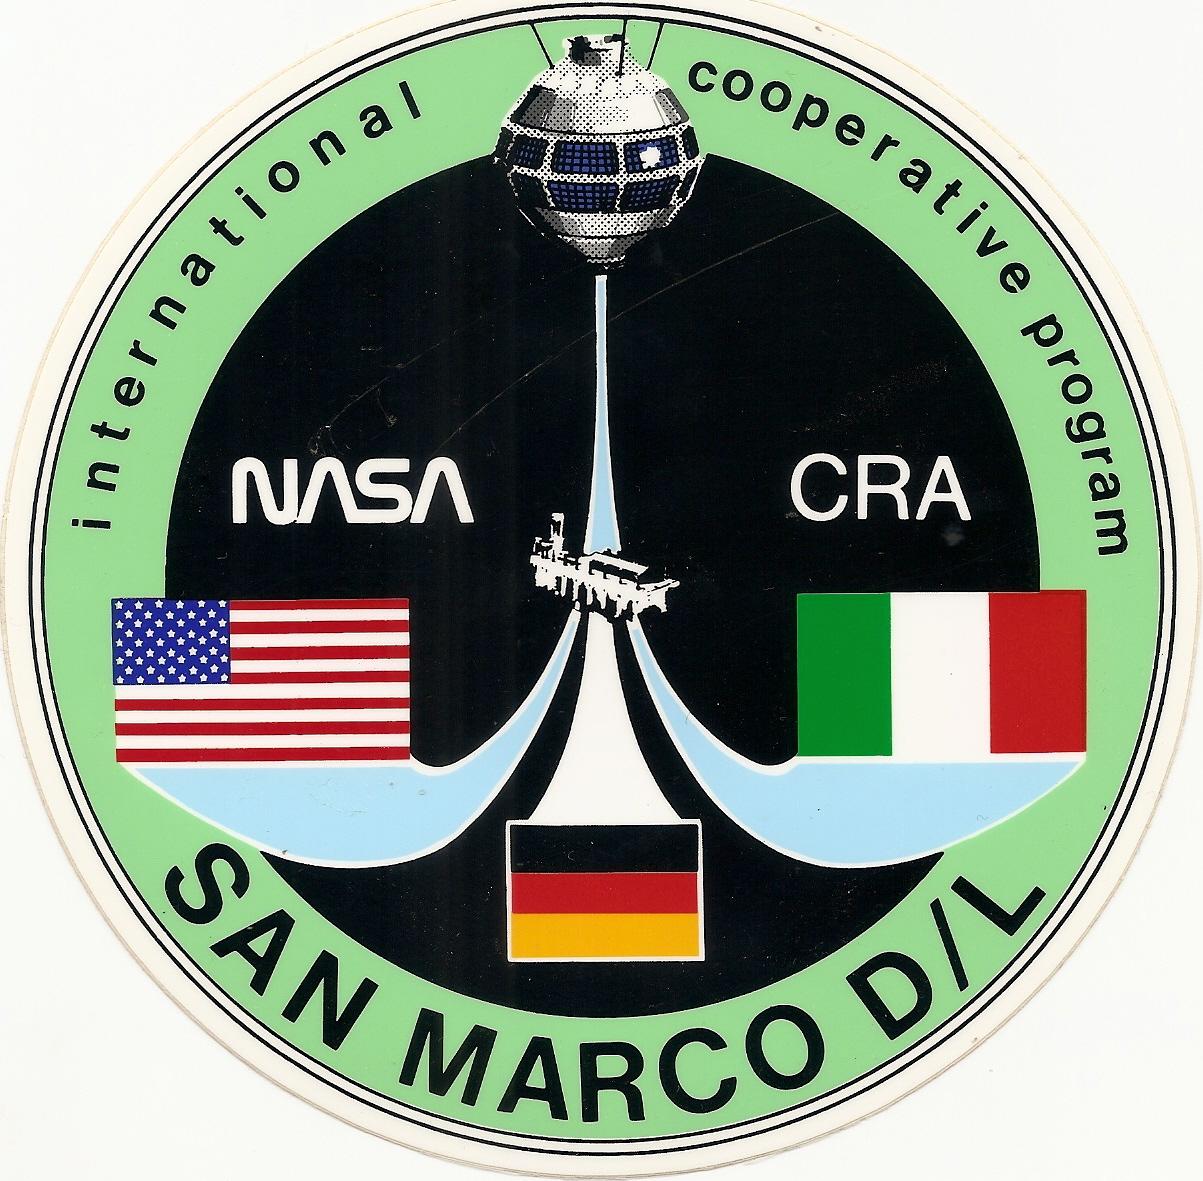 Adesivo satellite SM-DL (SM-5).jpg